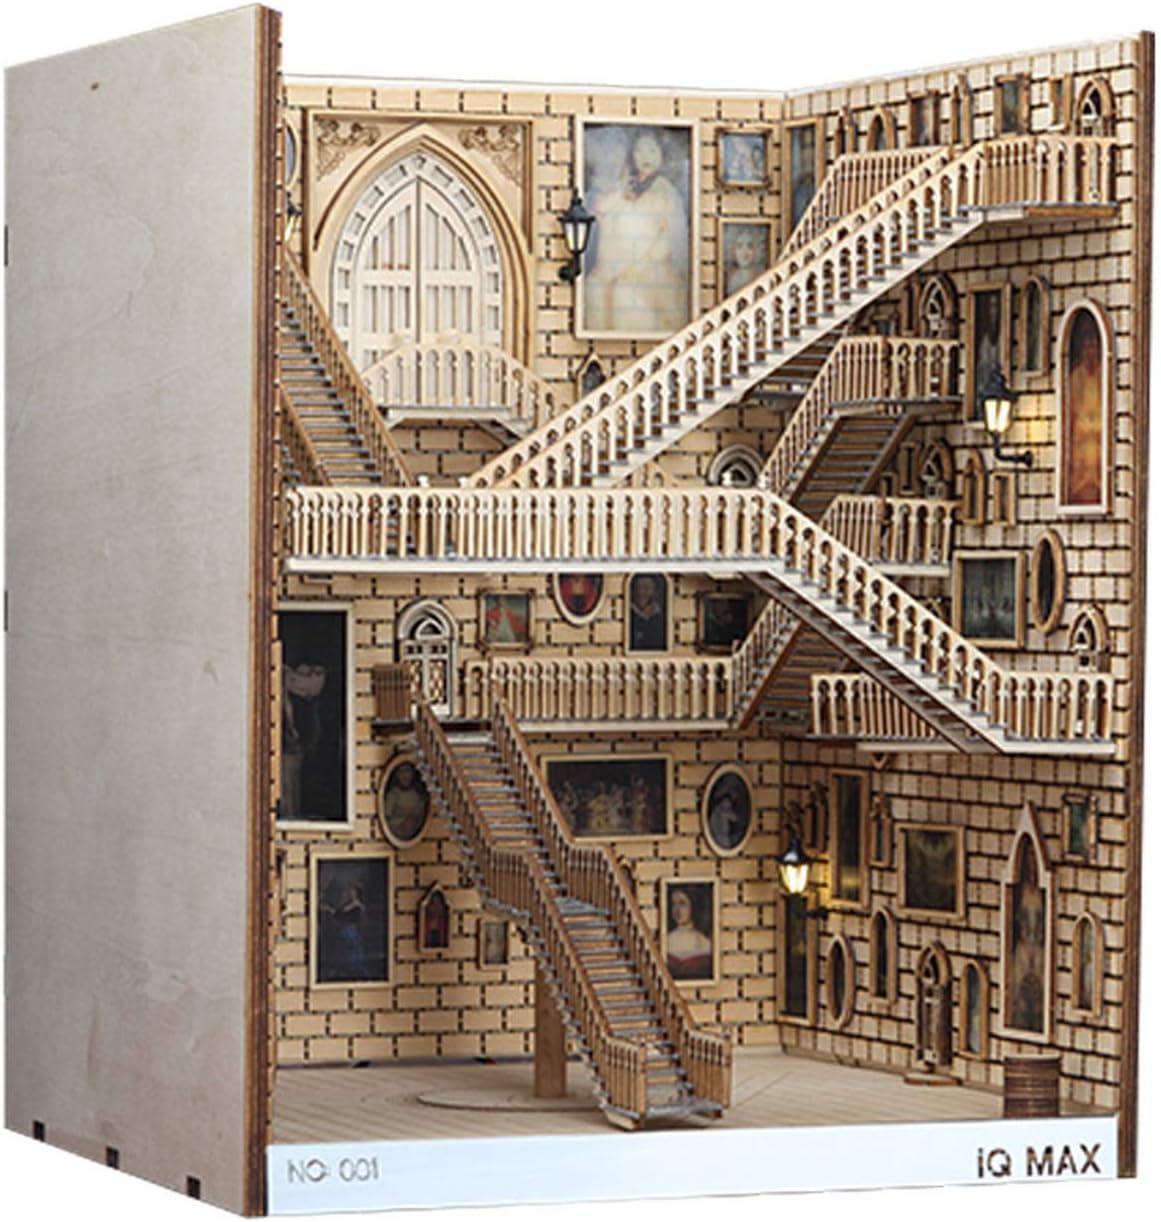 LUOWAN Wooden Book Nook Inserts Art Bookends DIY Bookshelf Decor Stand Decoration Fairy Garden Miniatures Home Decoration Accessories (Spiral Staircase, 10.28.88.5 in)